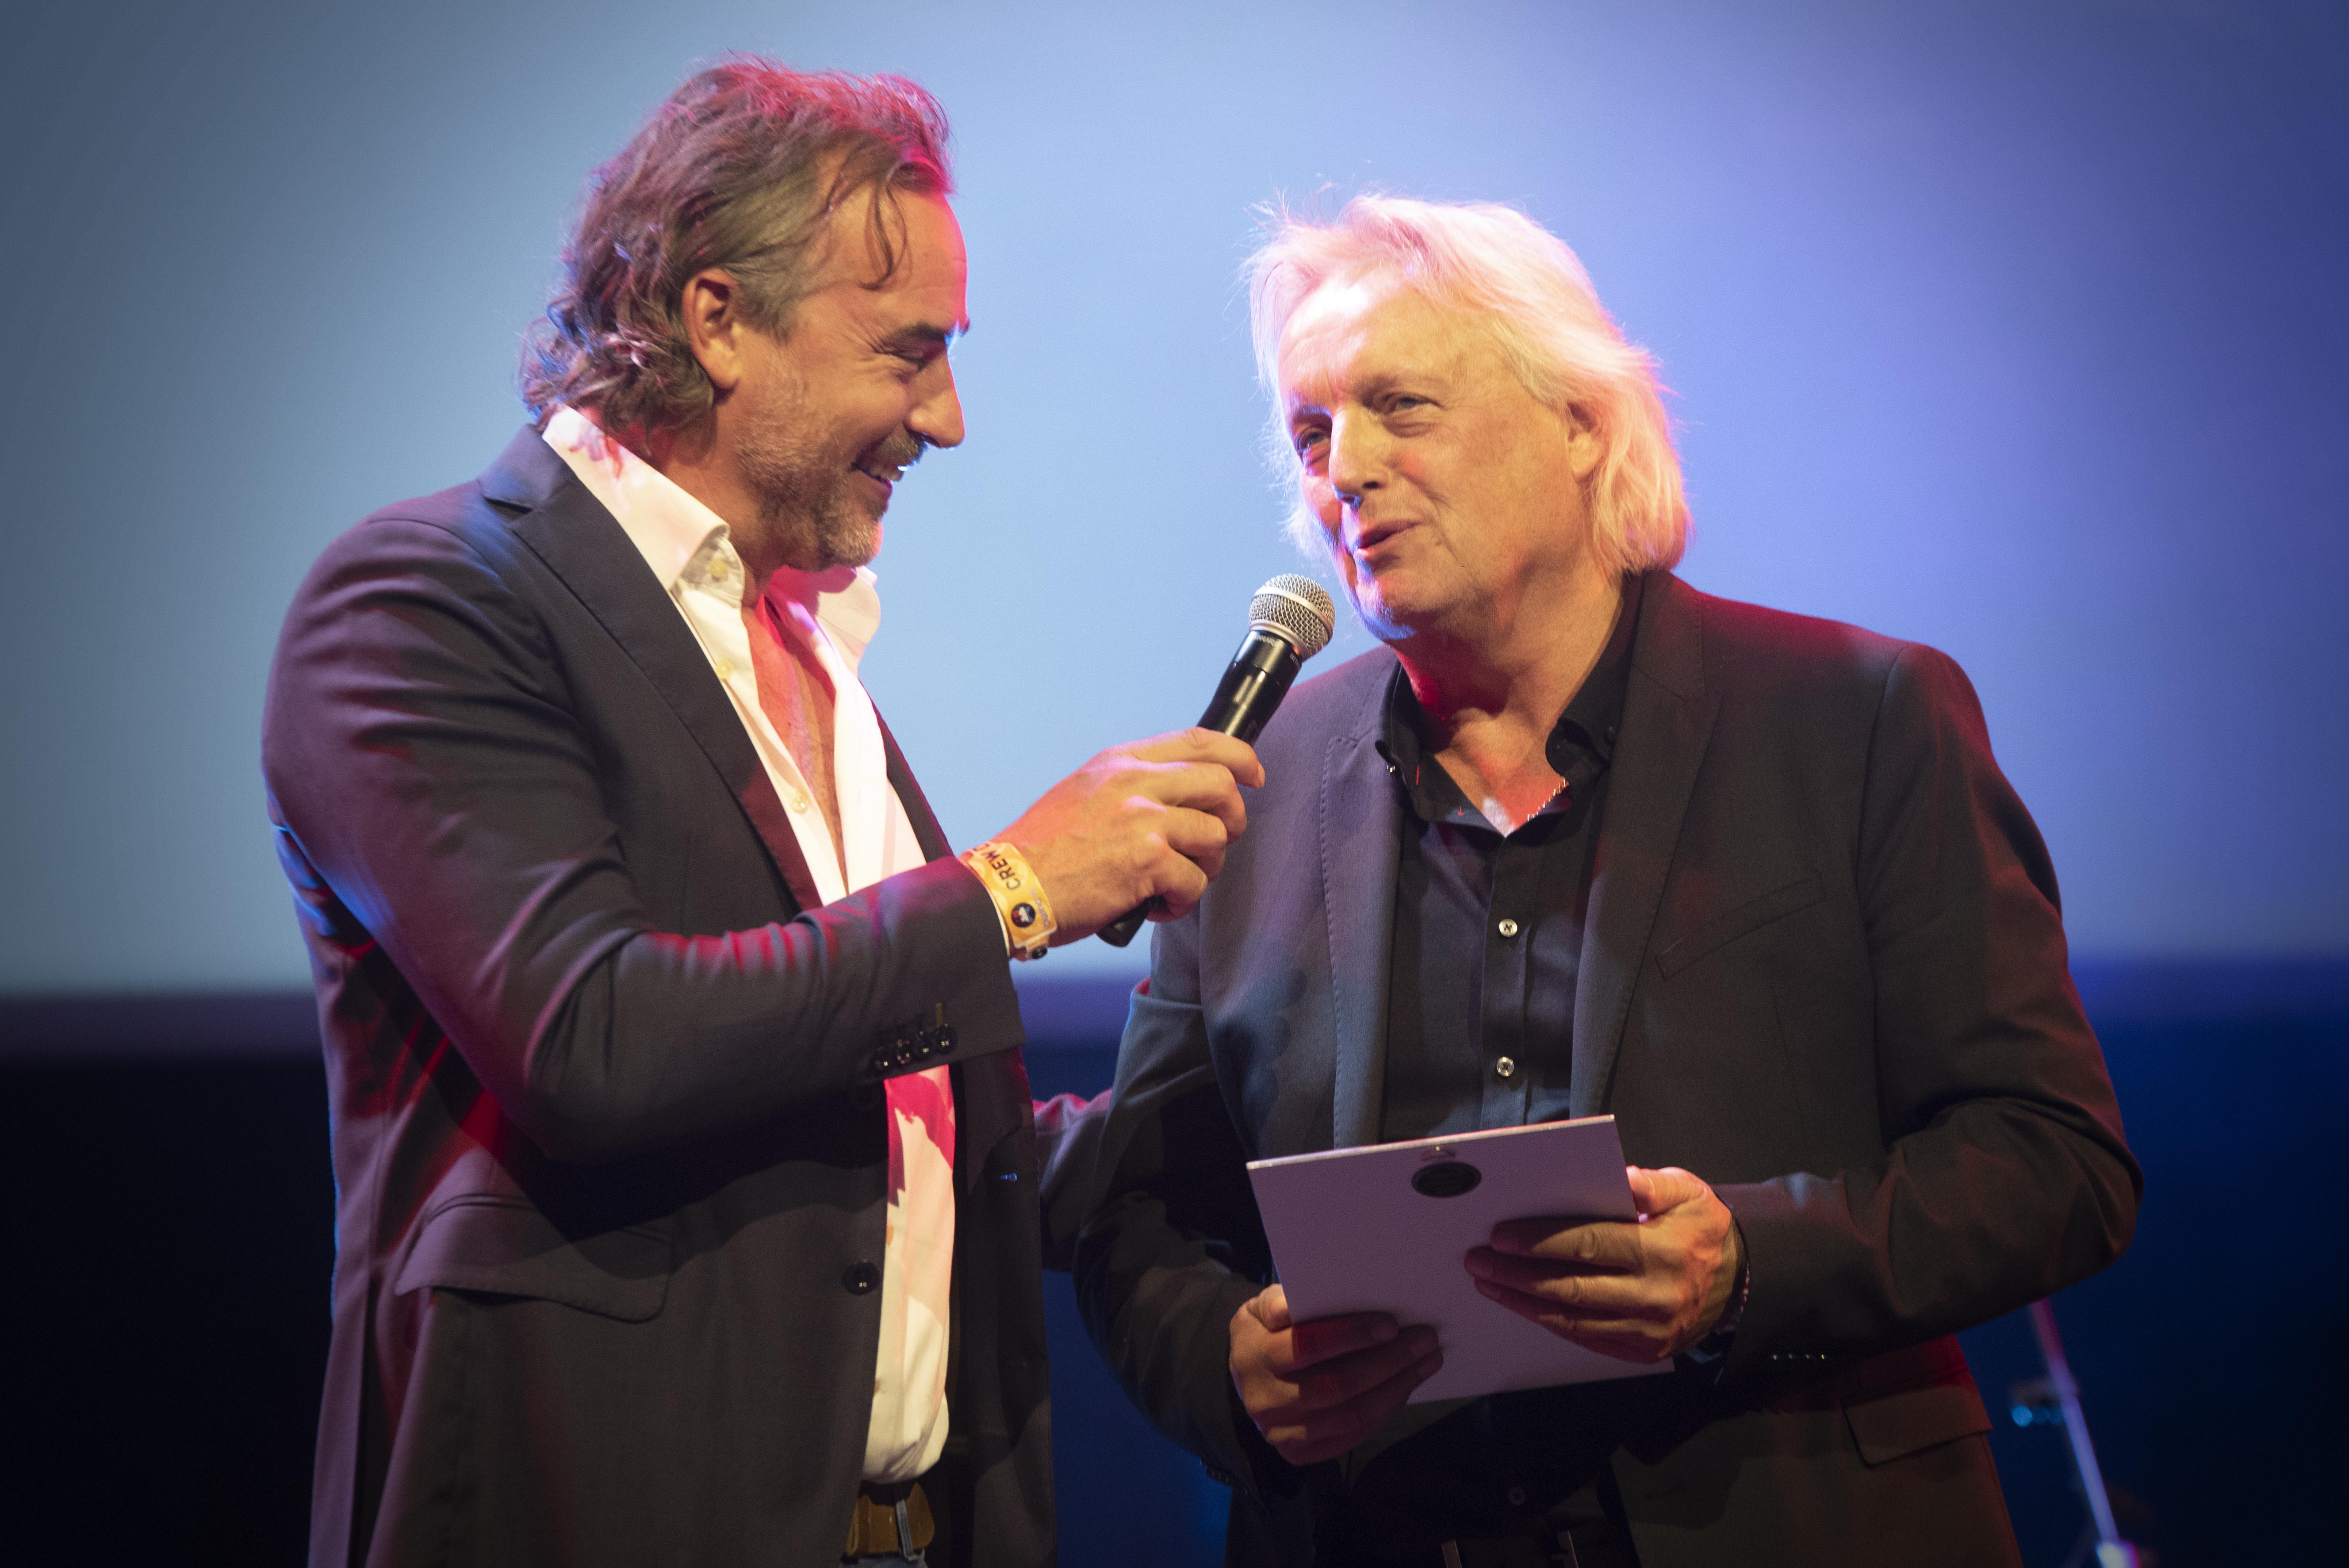 Thomas Tol tijdens Buma NL Awards 2018 - Fotocredits: Shali Blok (Artiestennieuws